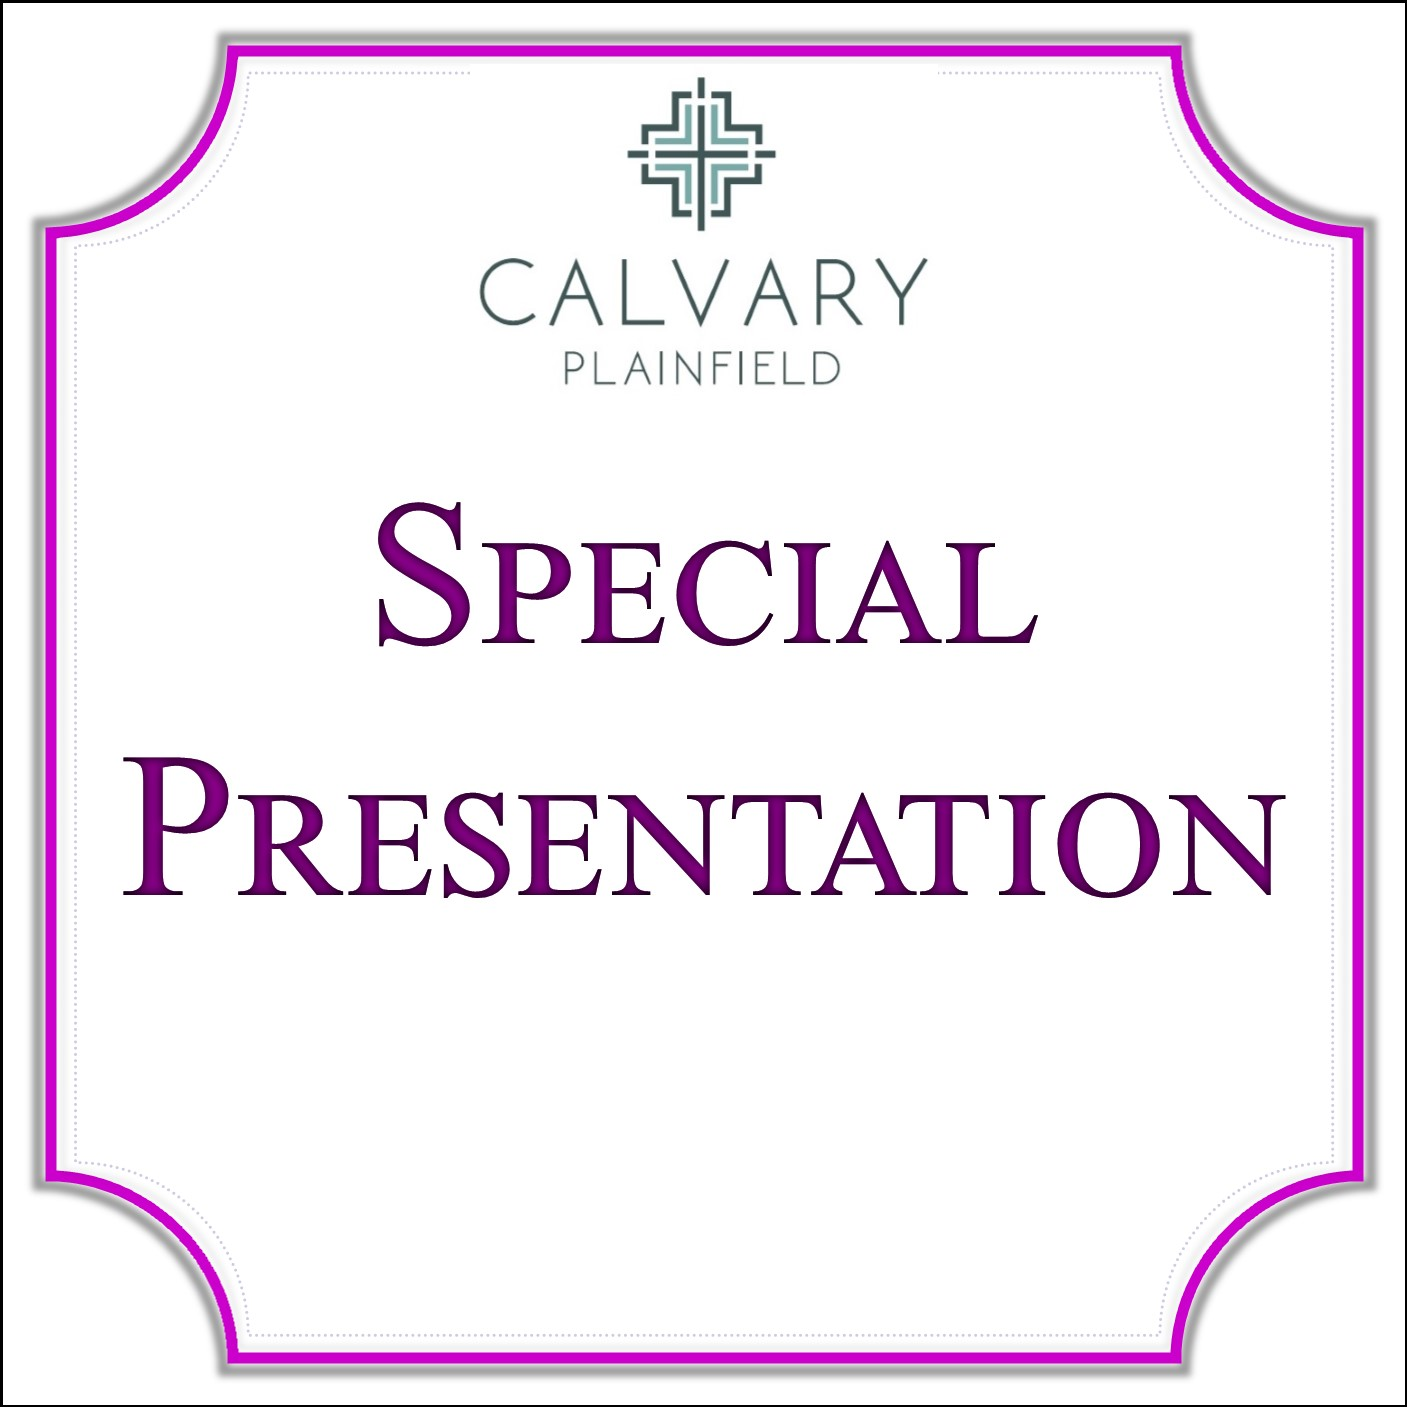 Special Presentation.jpg